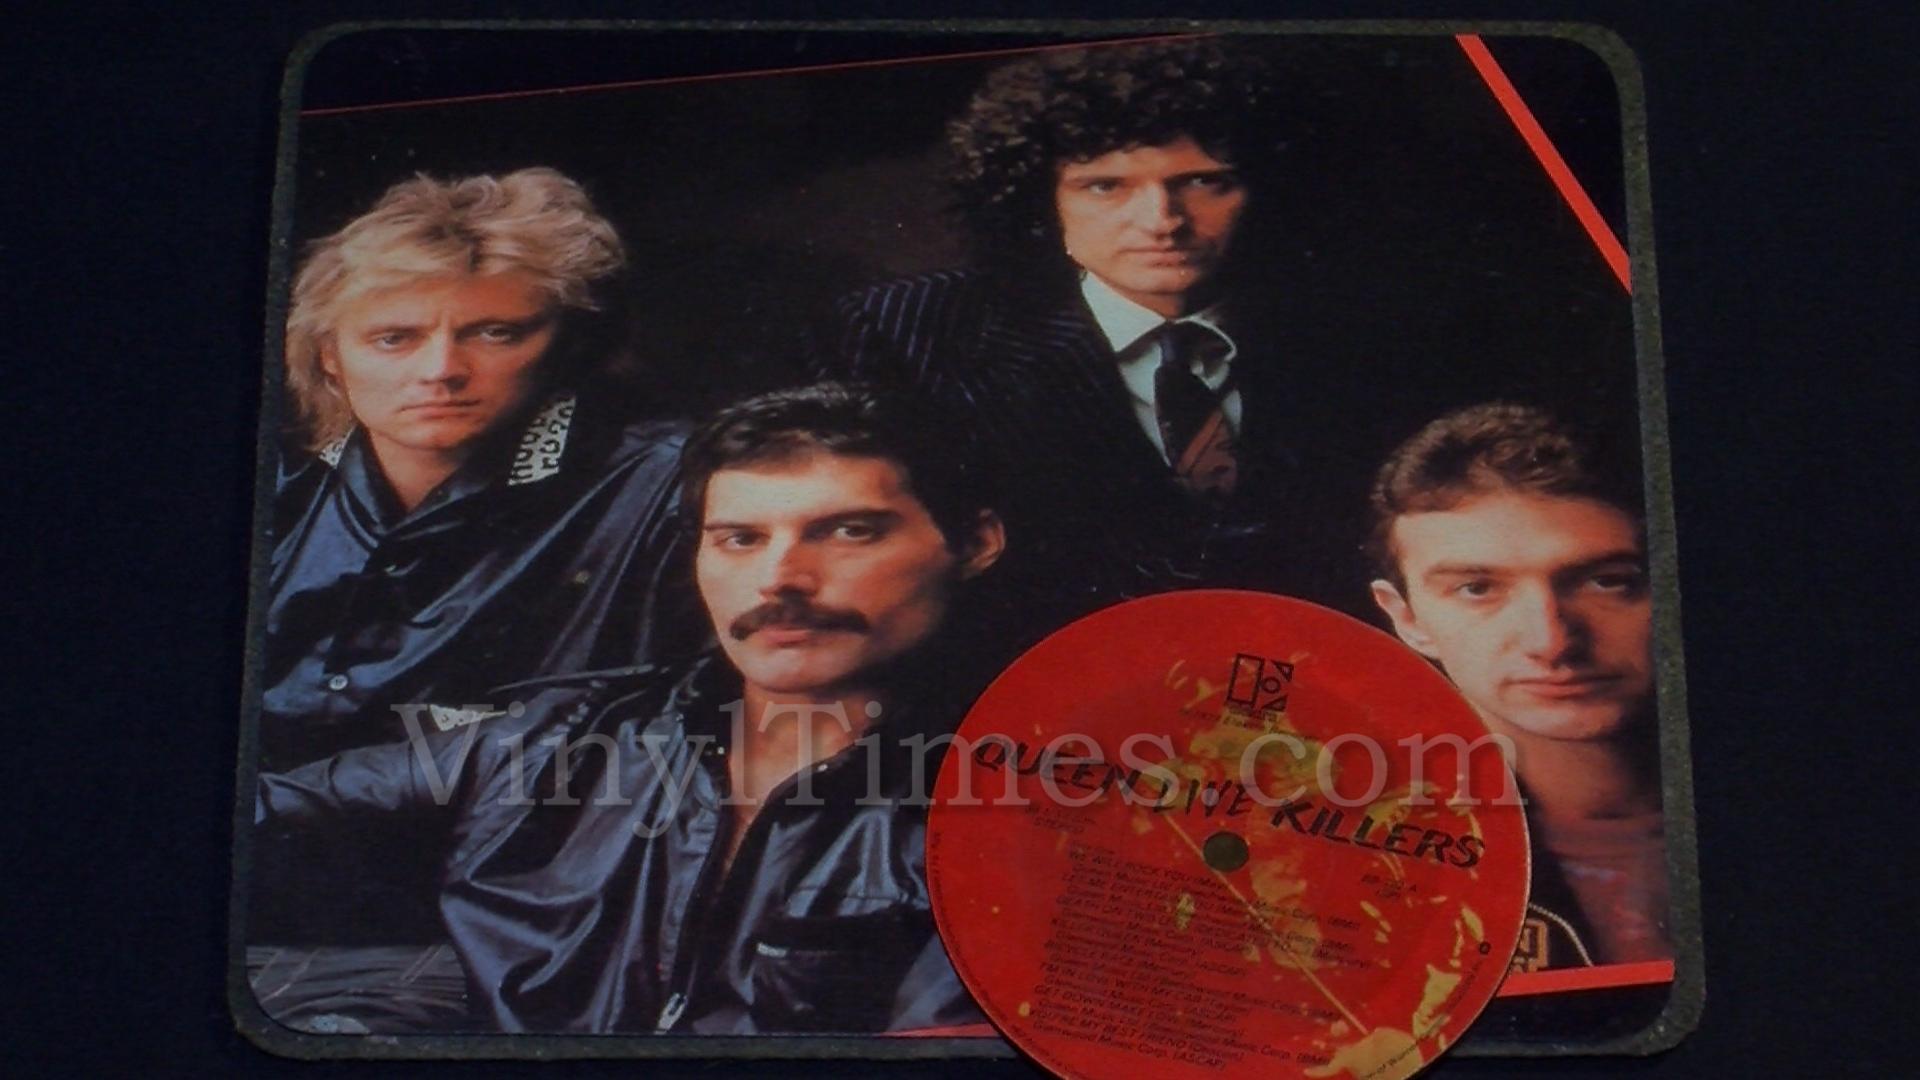 queen album cover mouse pad live killers vinyltimesvinyltimes. Black Bedroom Furniture Sets. Home Design Ideas